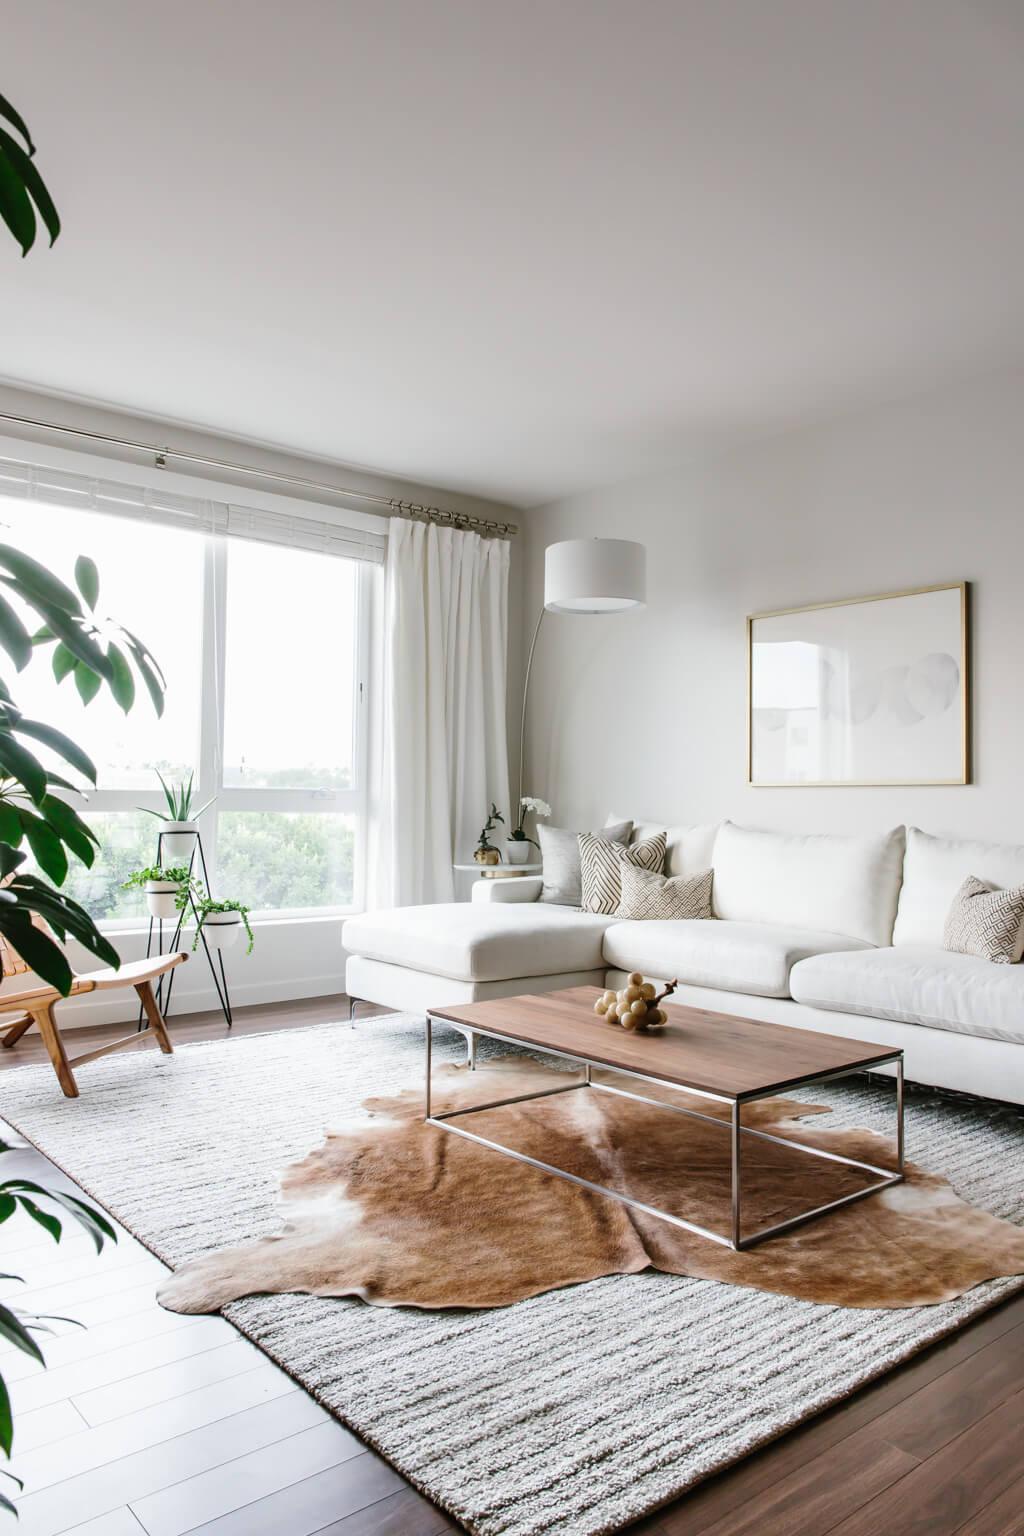 Minimalistic Living Room Elegant Designing My Modern and Minimalist Living Room with